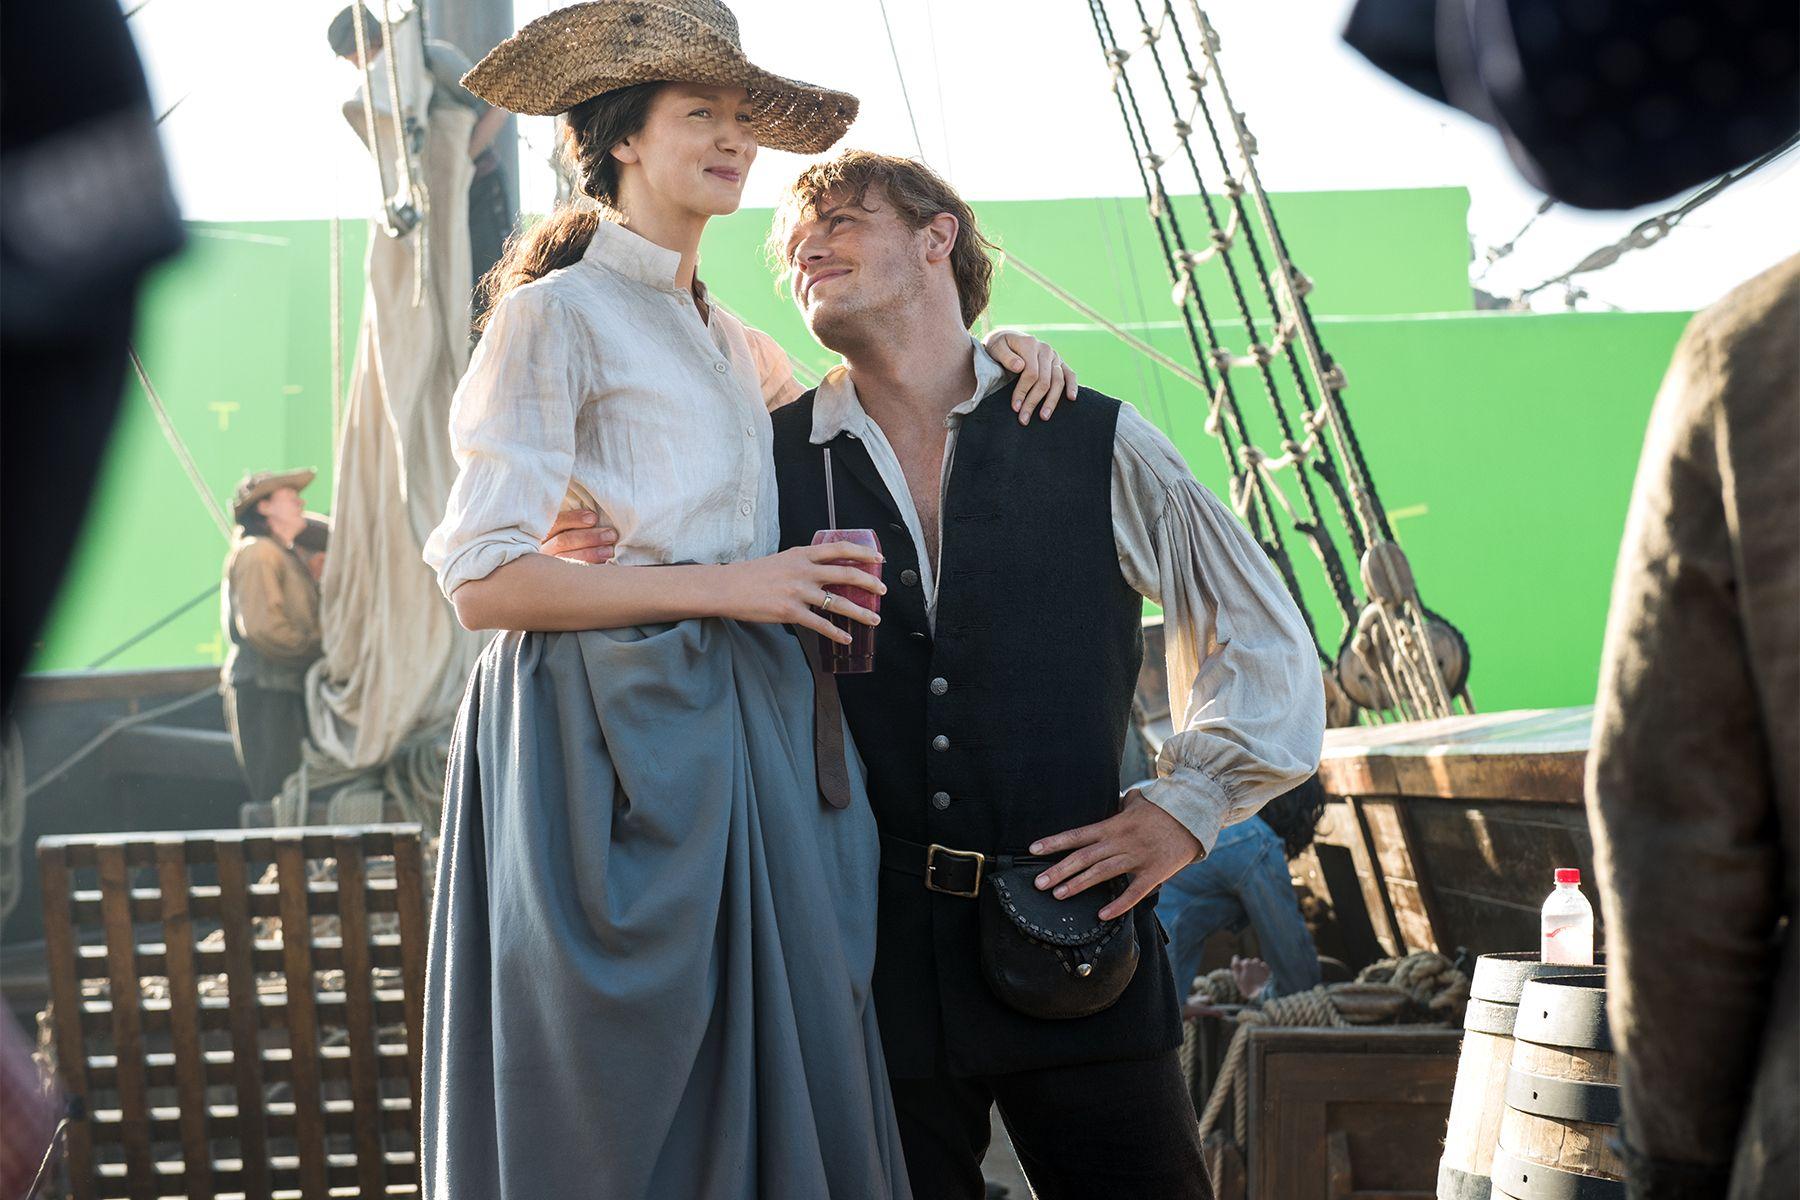 Caitriona Balfe and Sam Heughan on the Outlander set